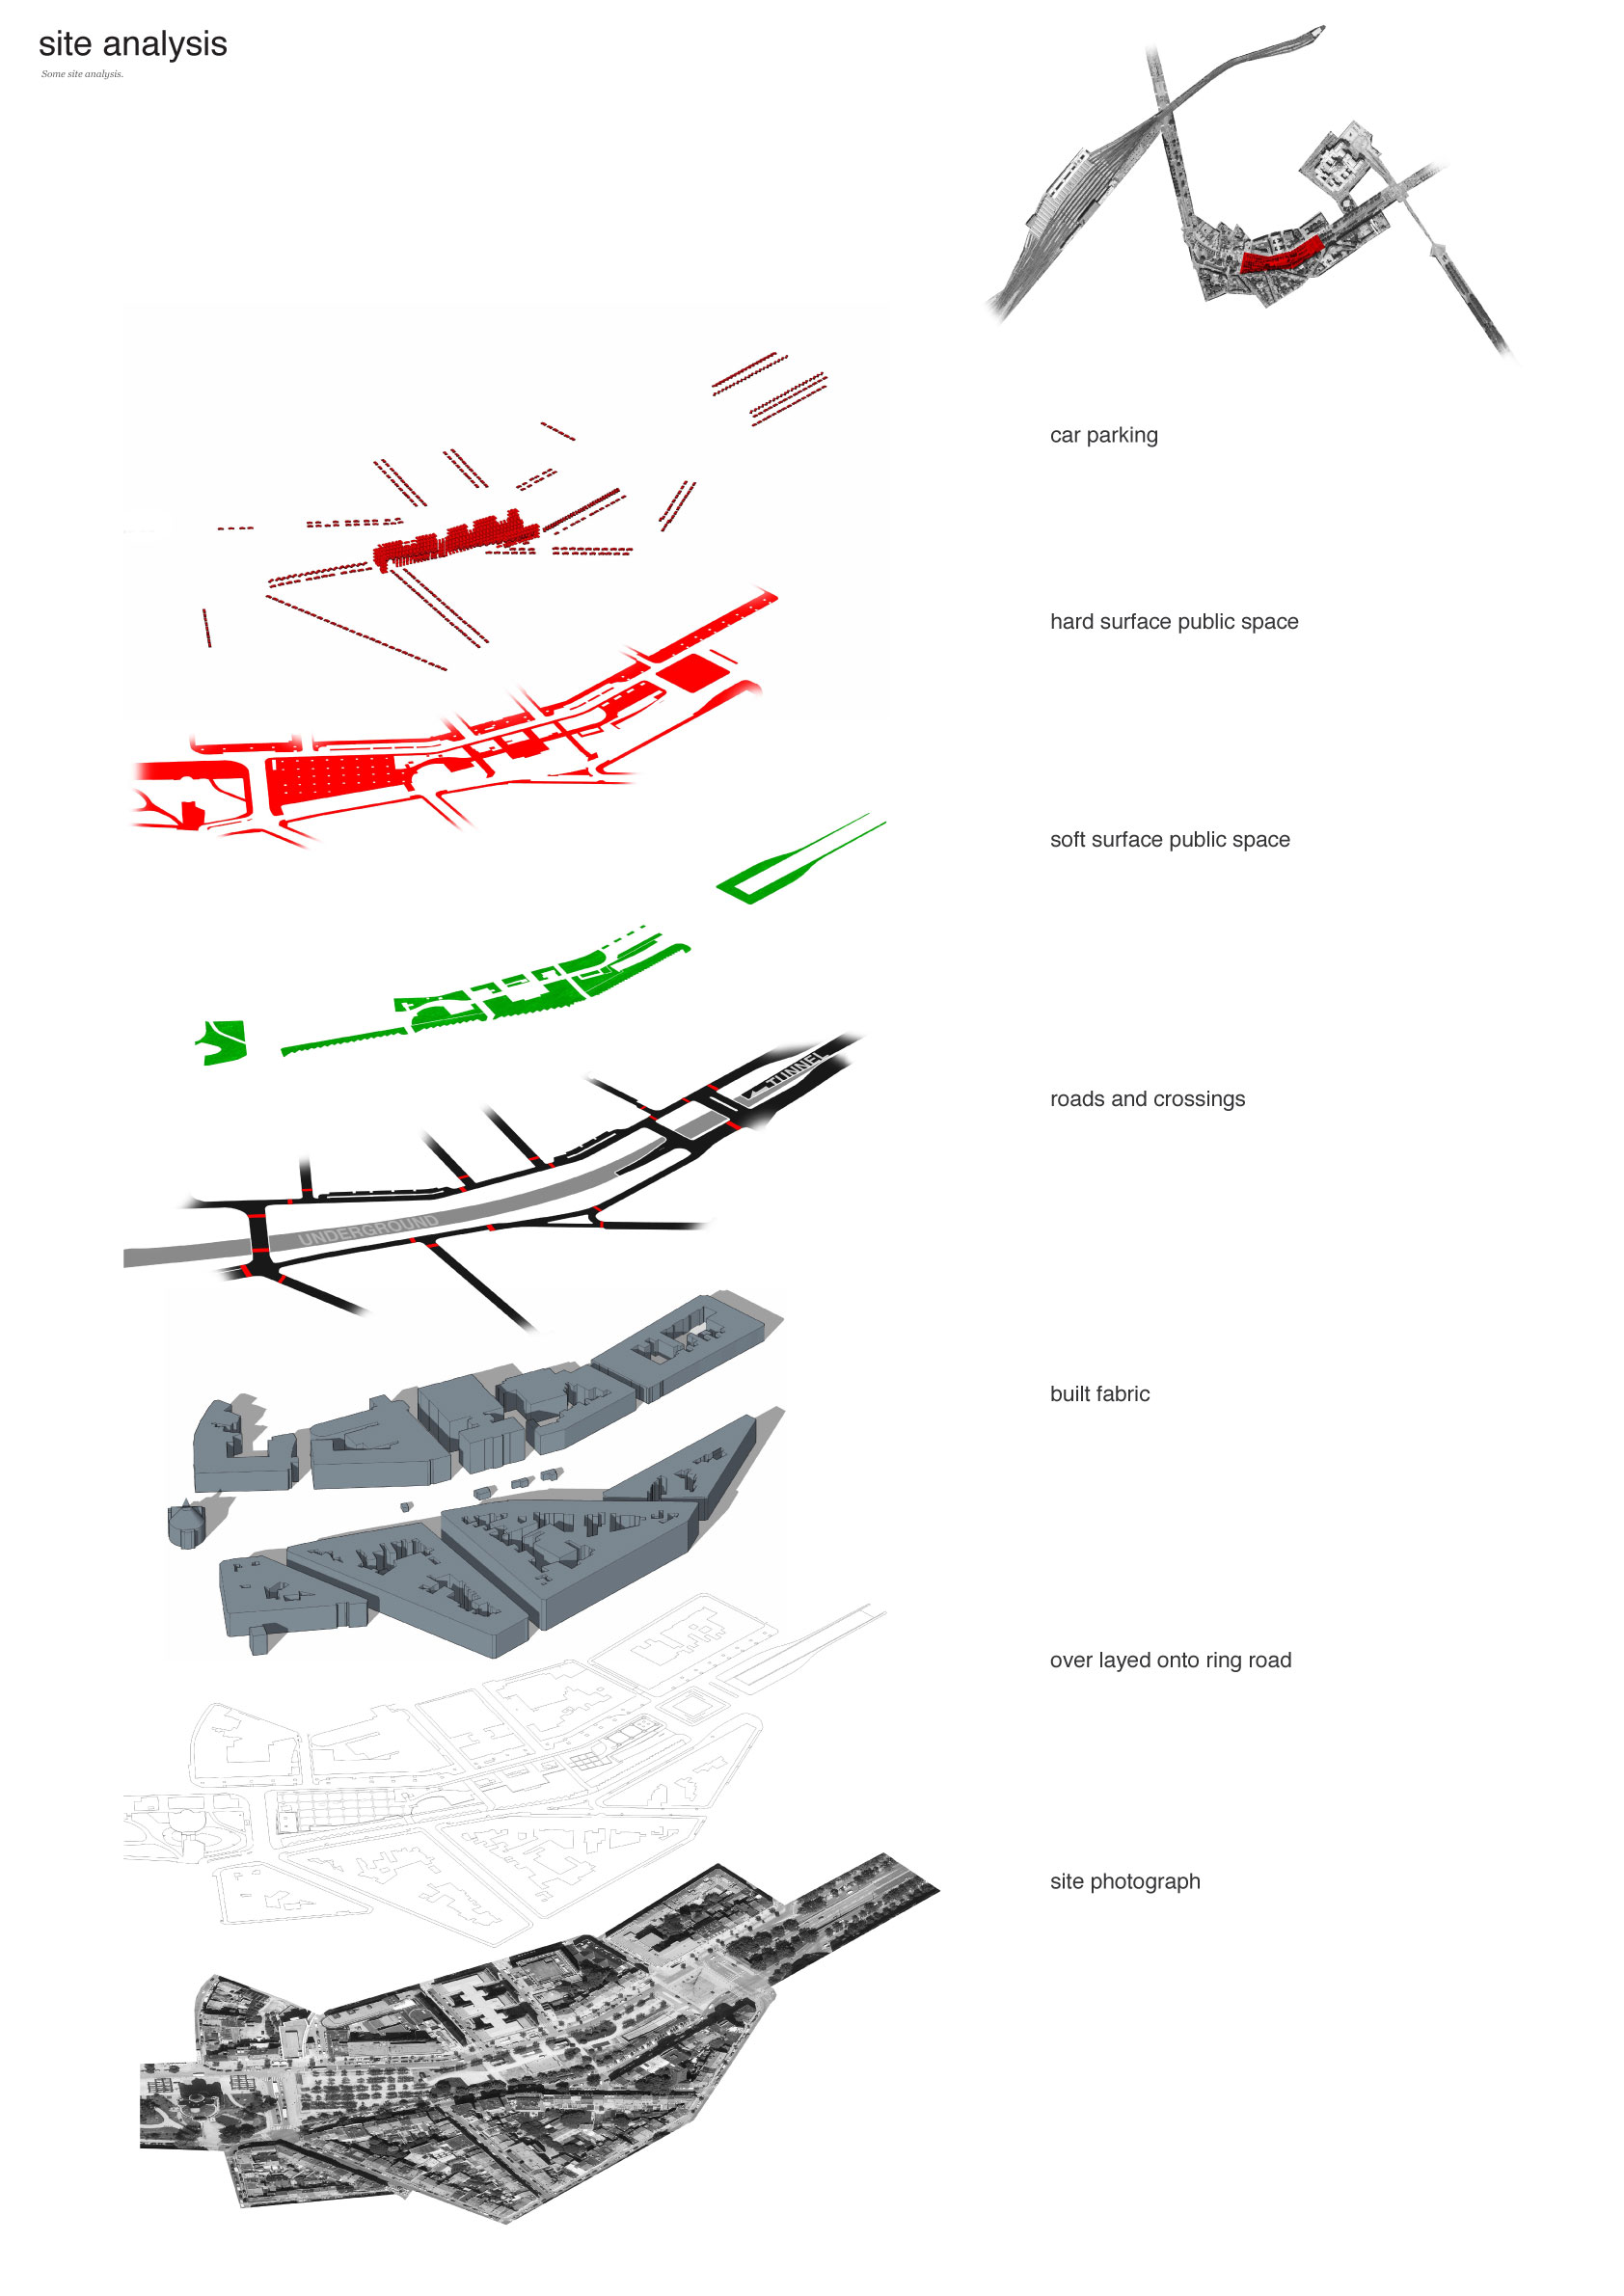 architecture site analysis diagram virus worksheet process work studio two relational